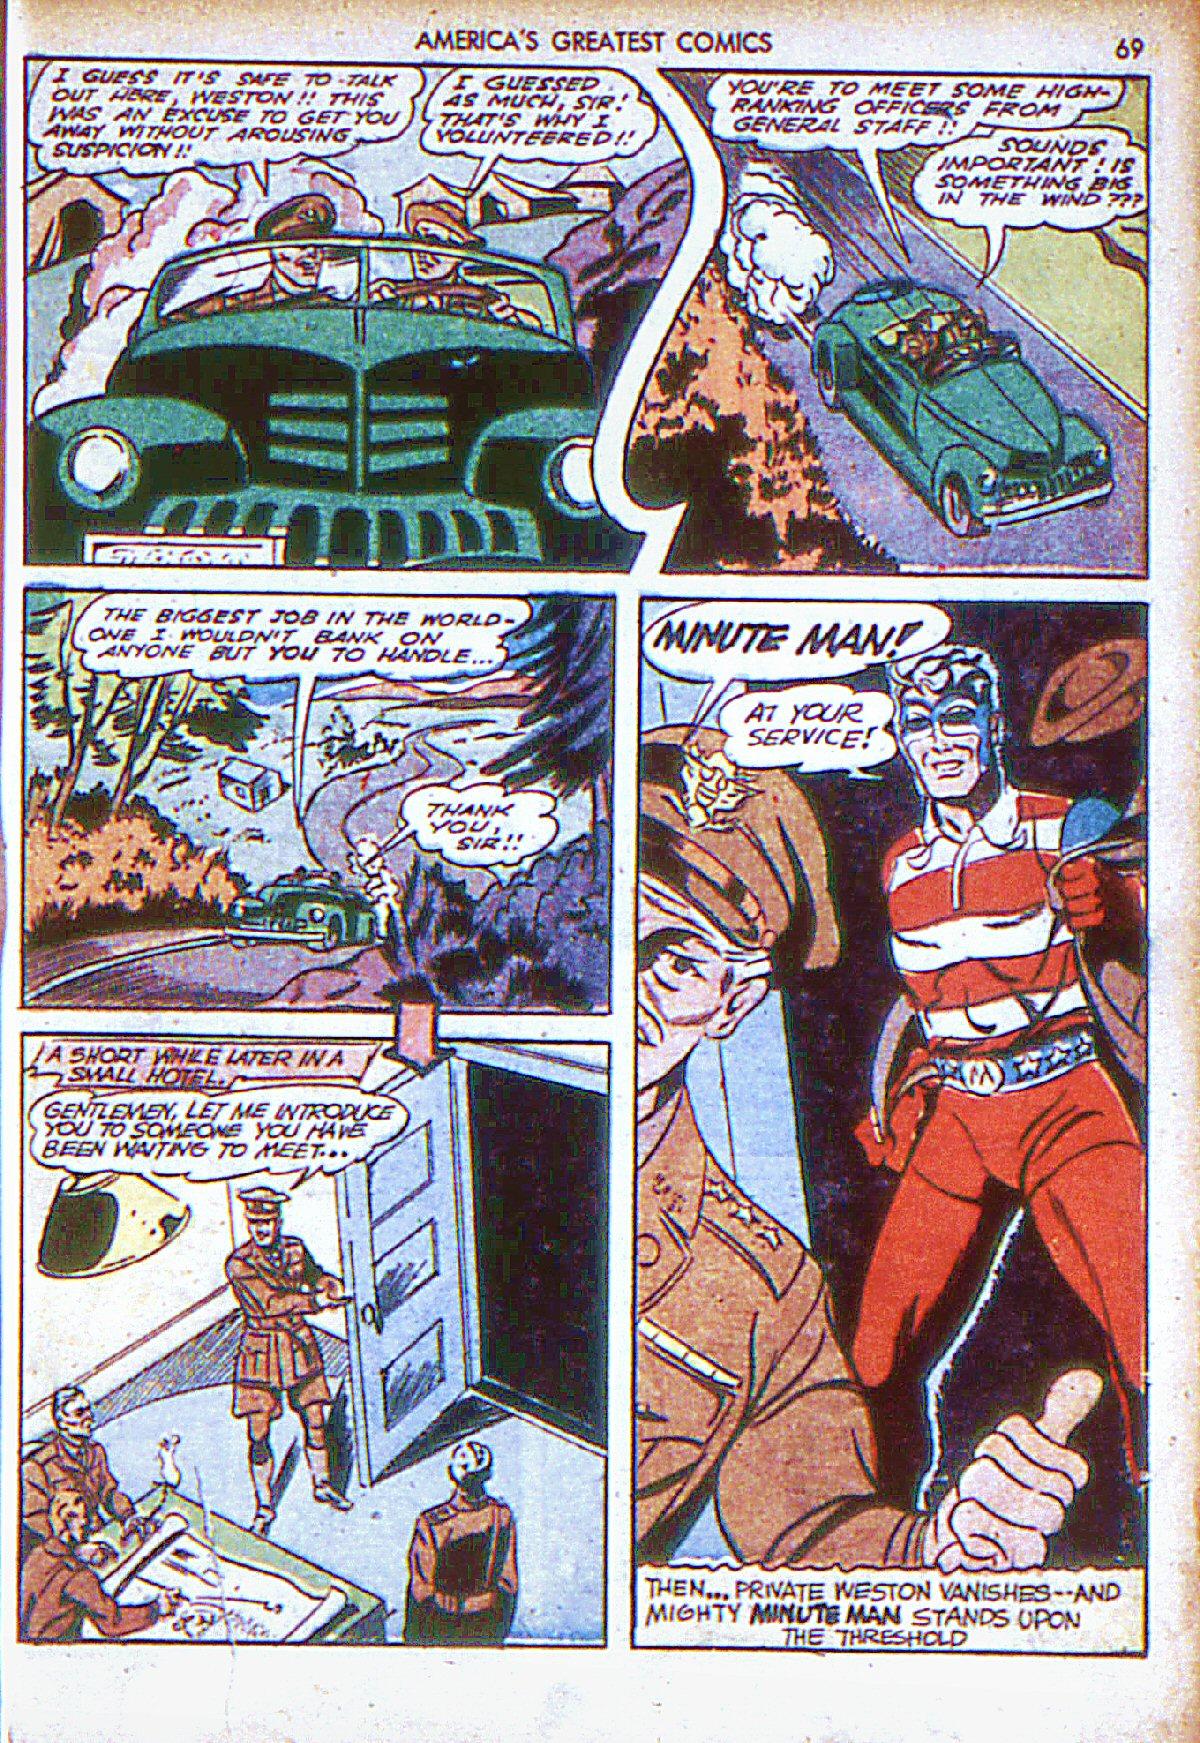 Read online America's Greatest Comics comic -  Issue #6 - 70